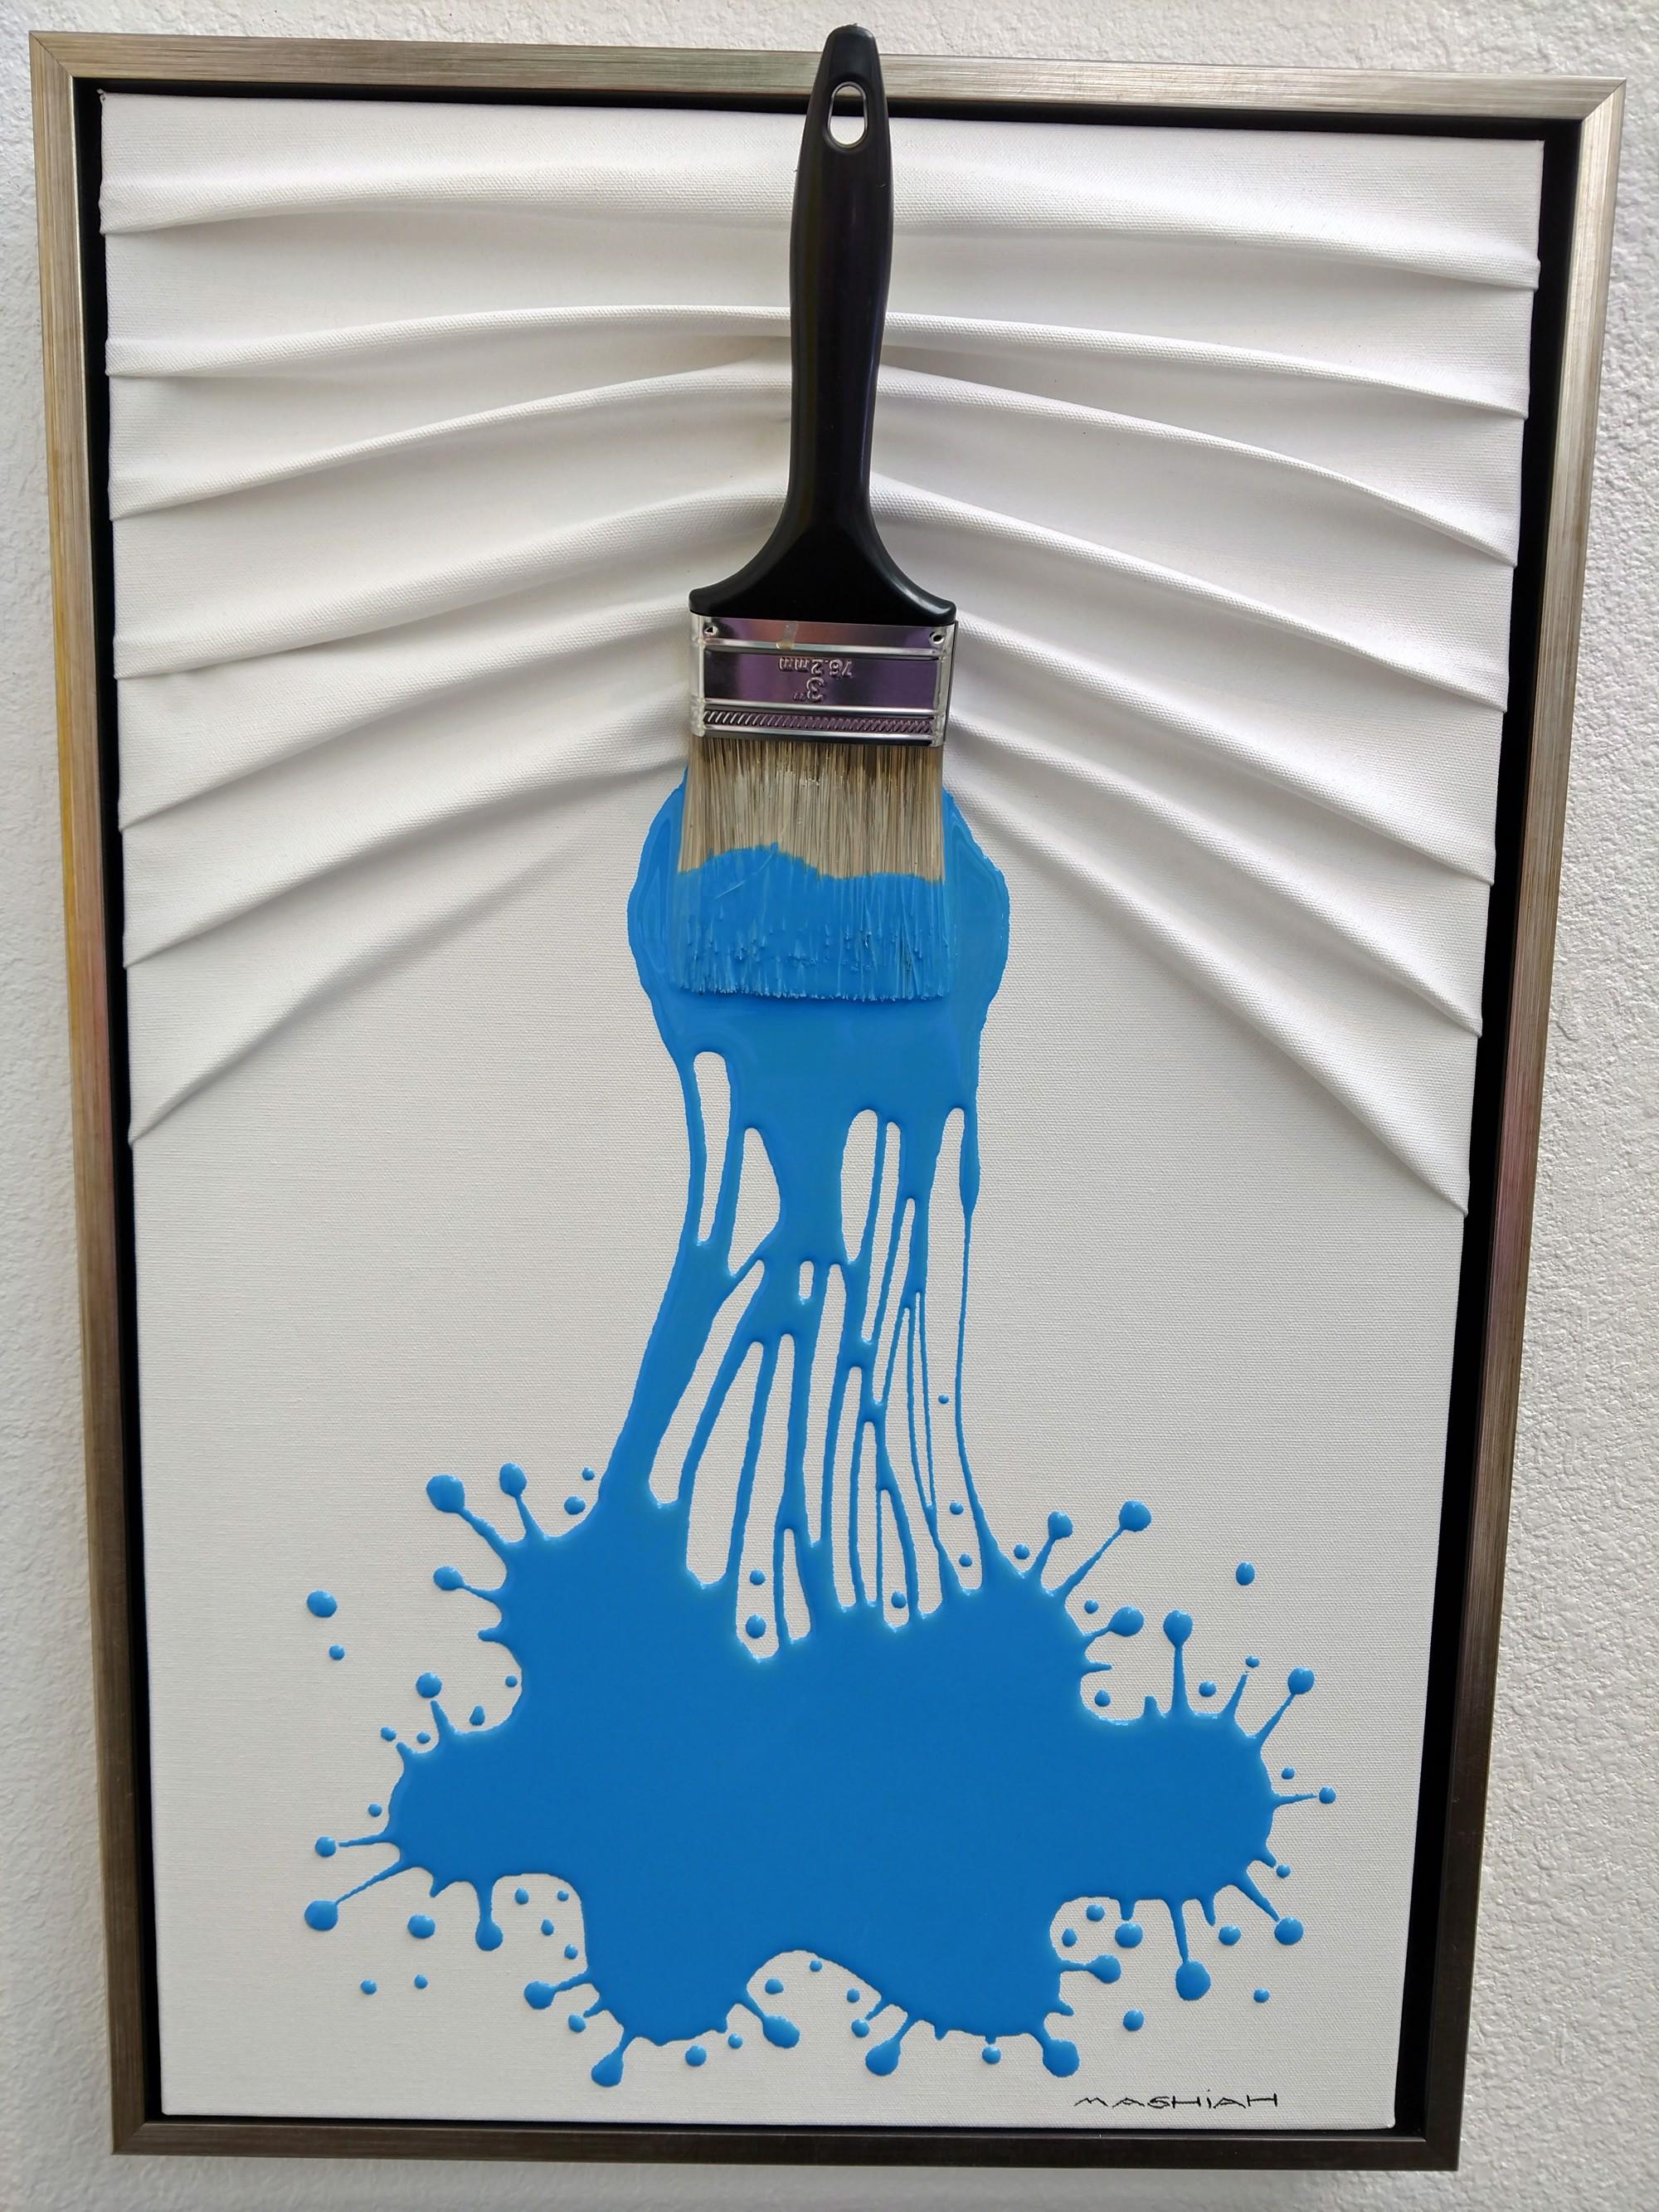 Lets Paint Small Blue on White by Efi Mashiah